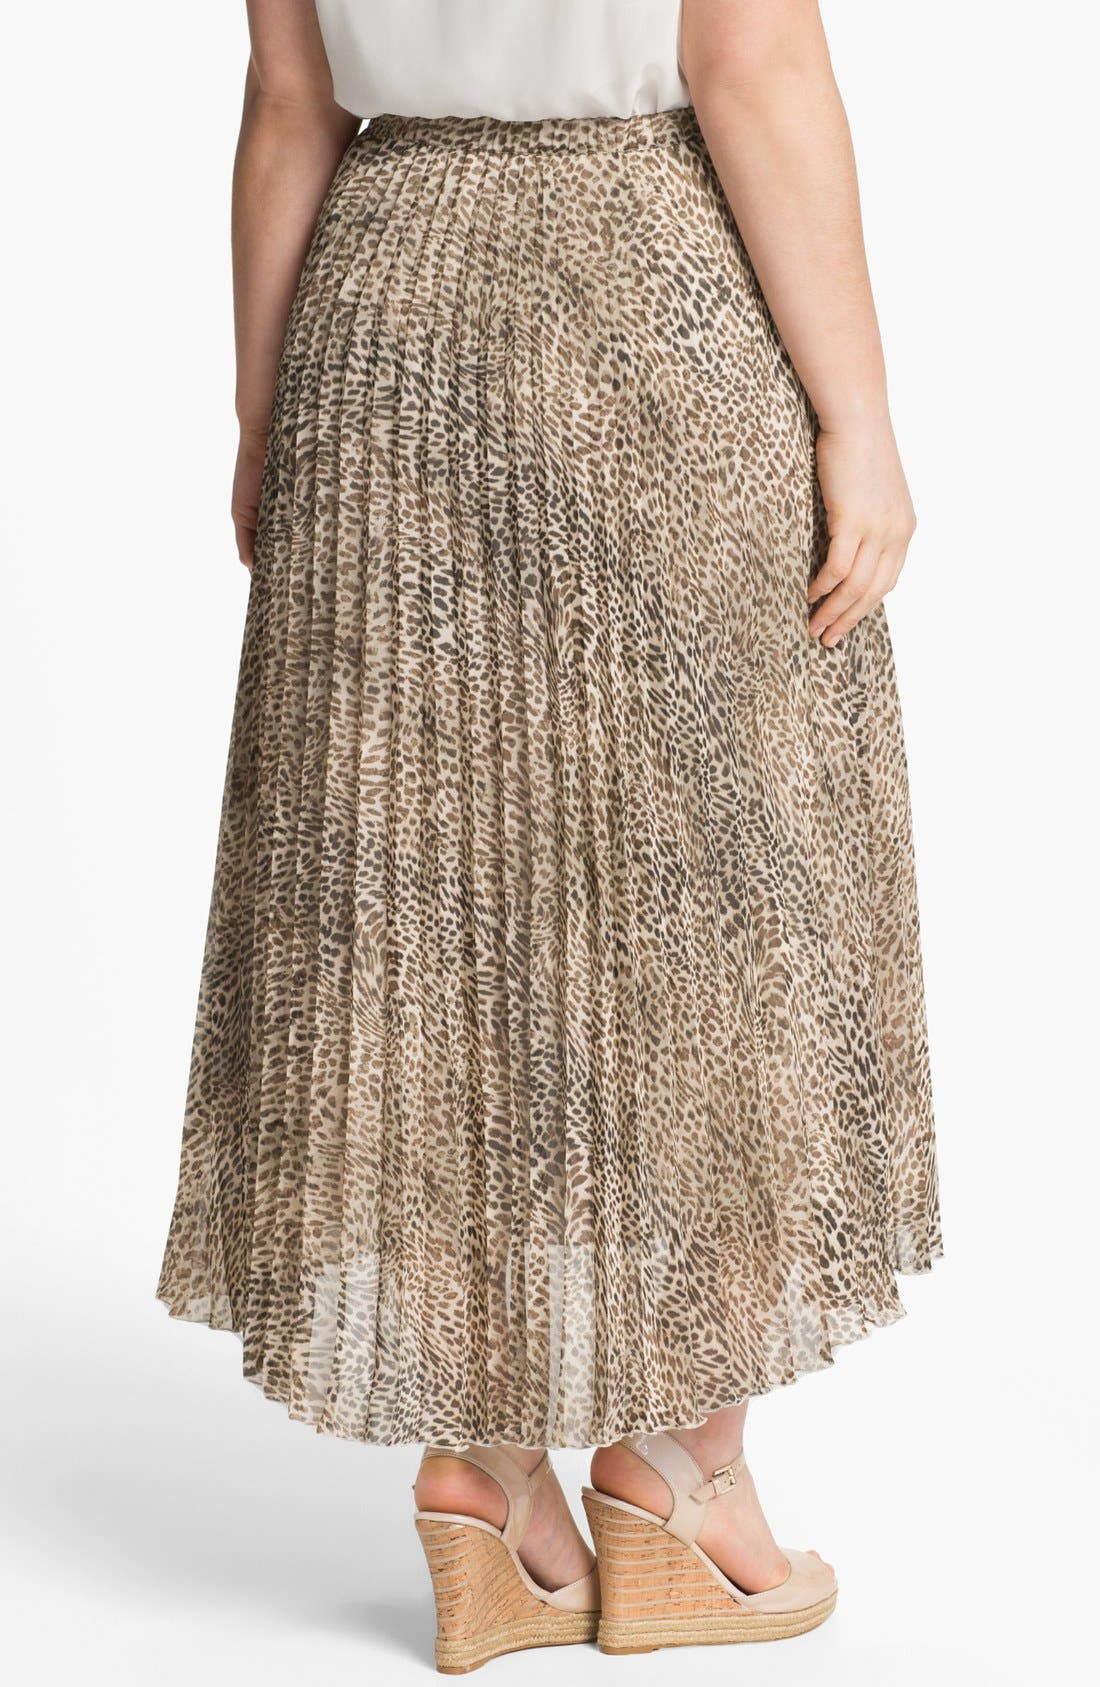 Alternate Image 2  - Vince Camuto Cheetah Print Chiffon Skirt (Plus Size)